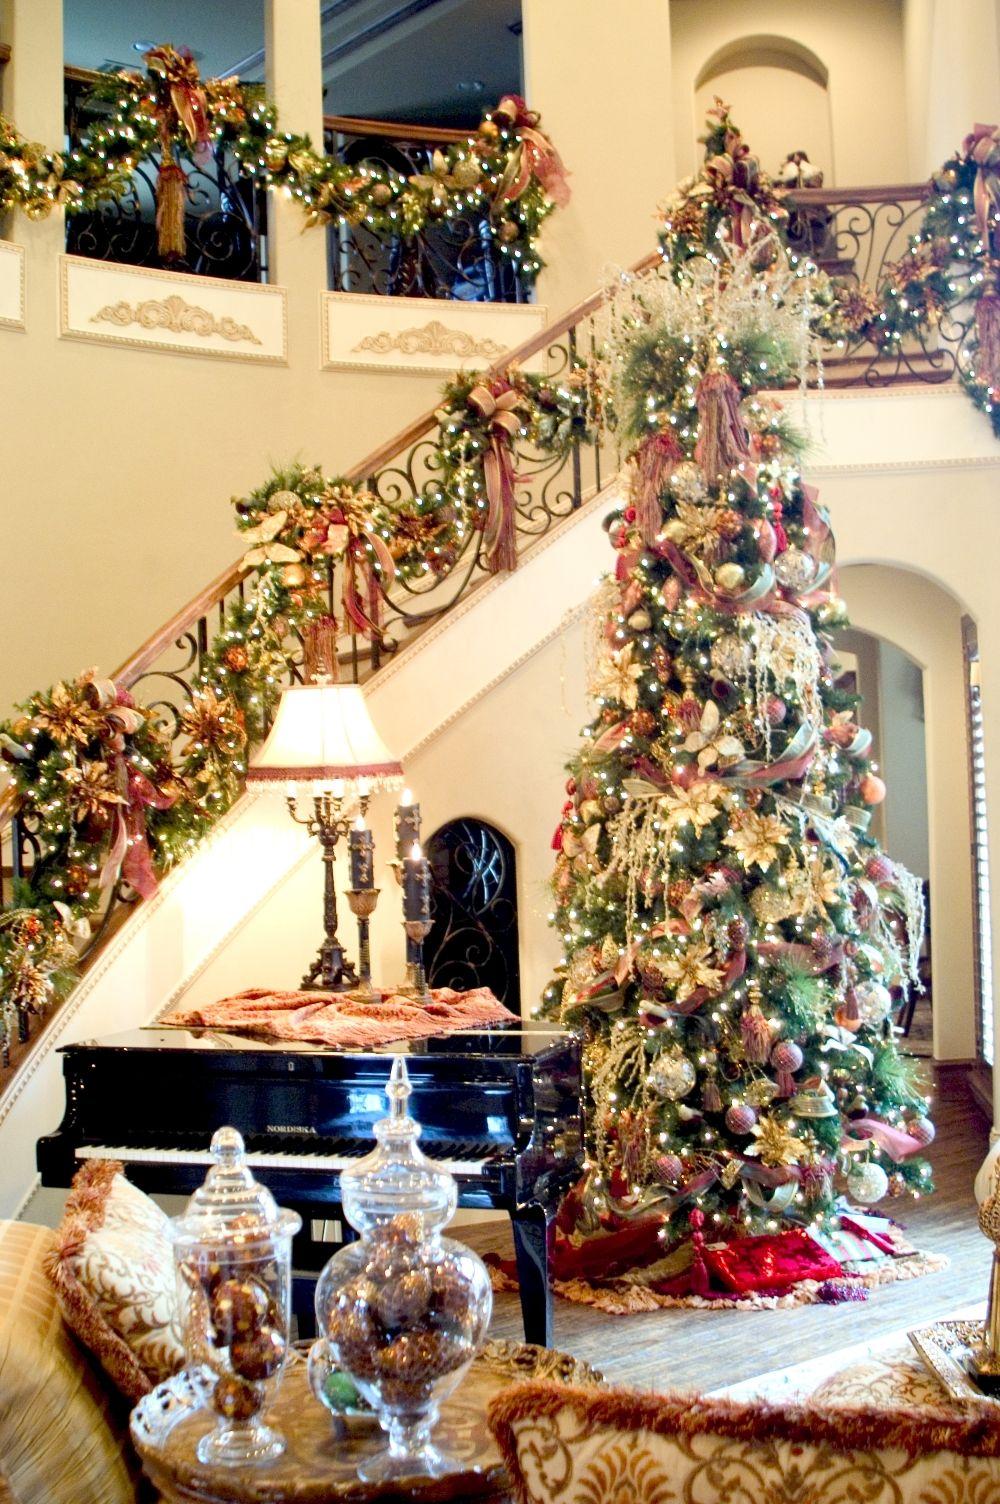 Christmas Decorations For Home Interior Christmas Decorations